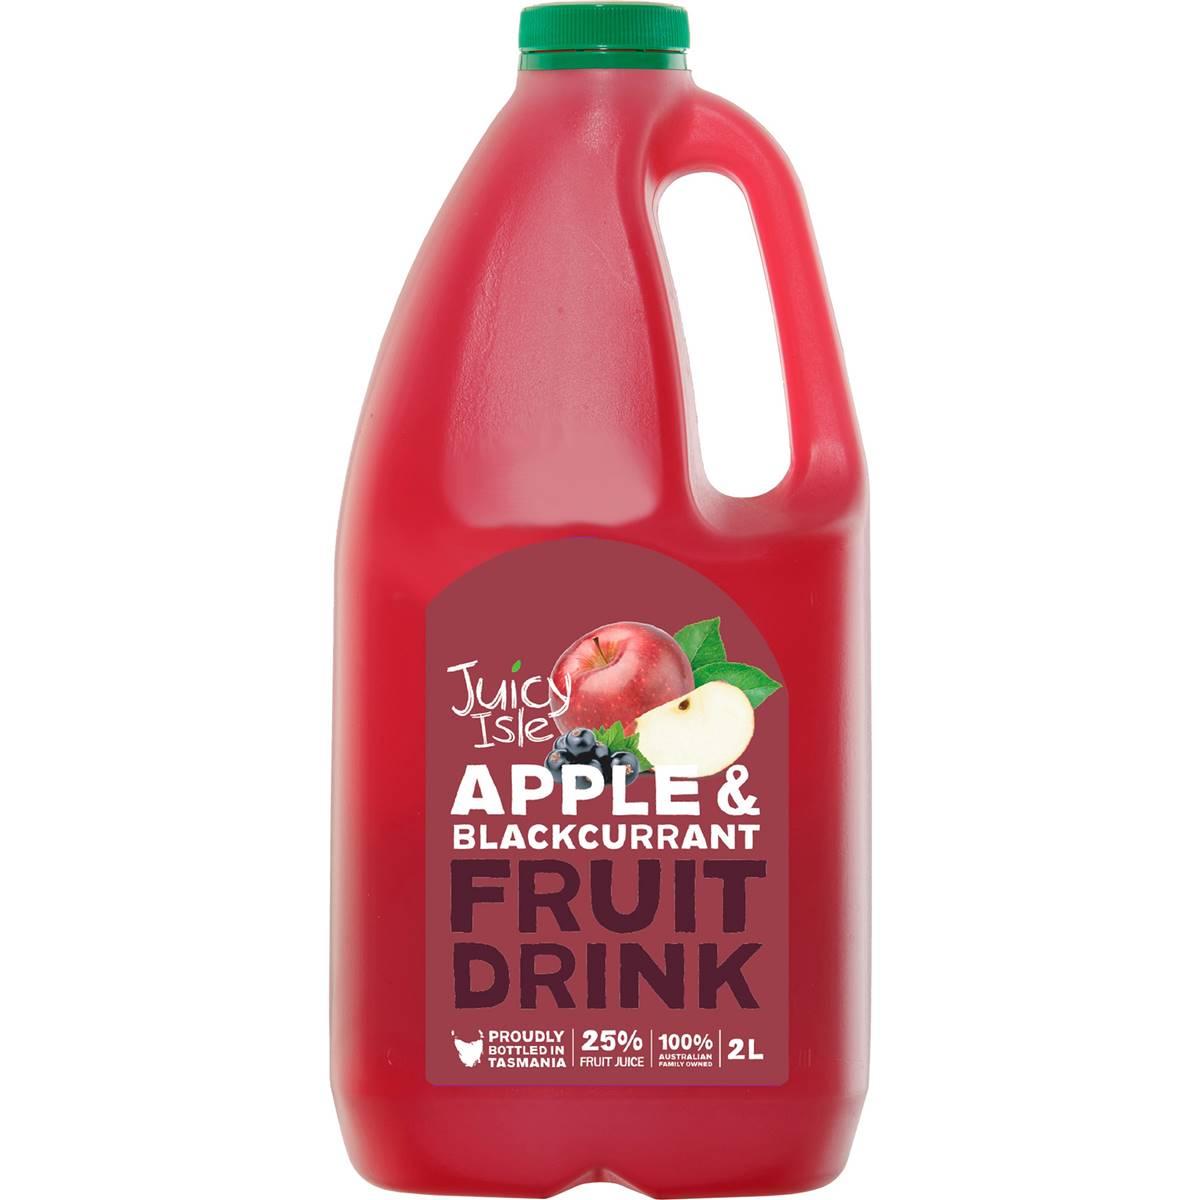 Juicy Isle Apple & Blackcurrant Fruit Drink